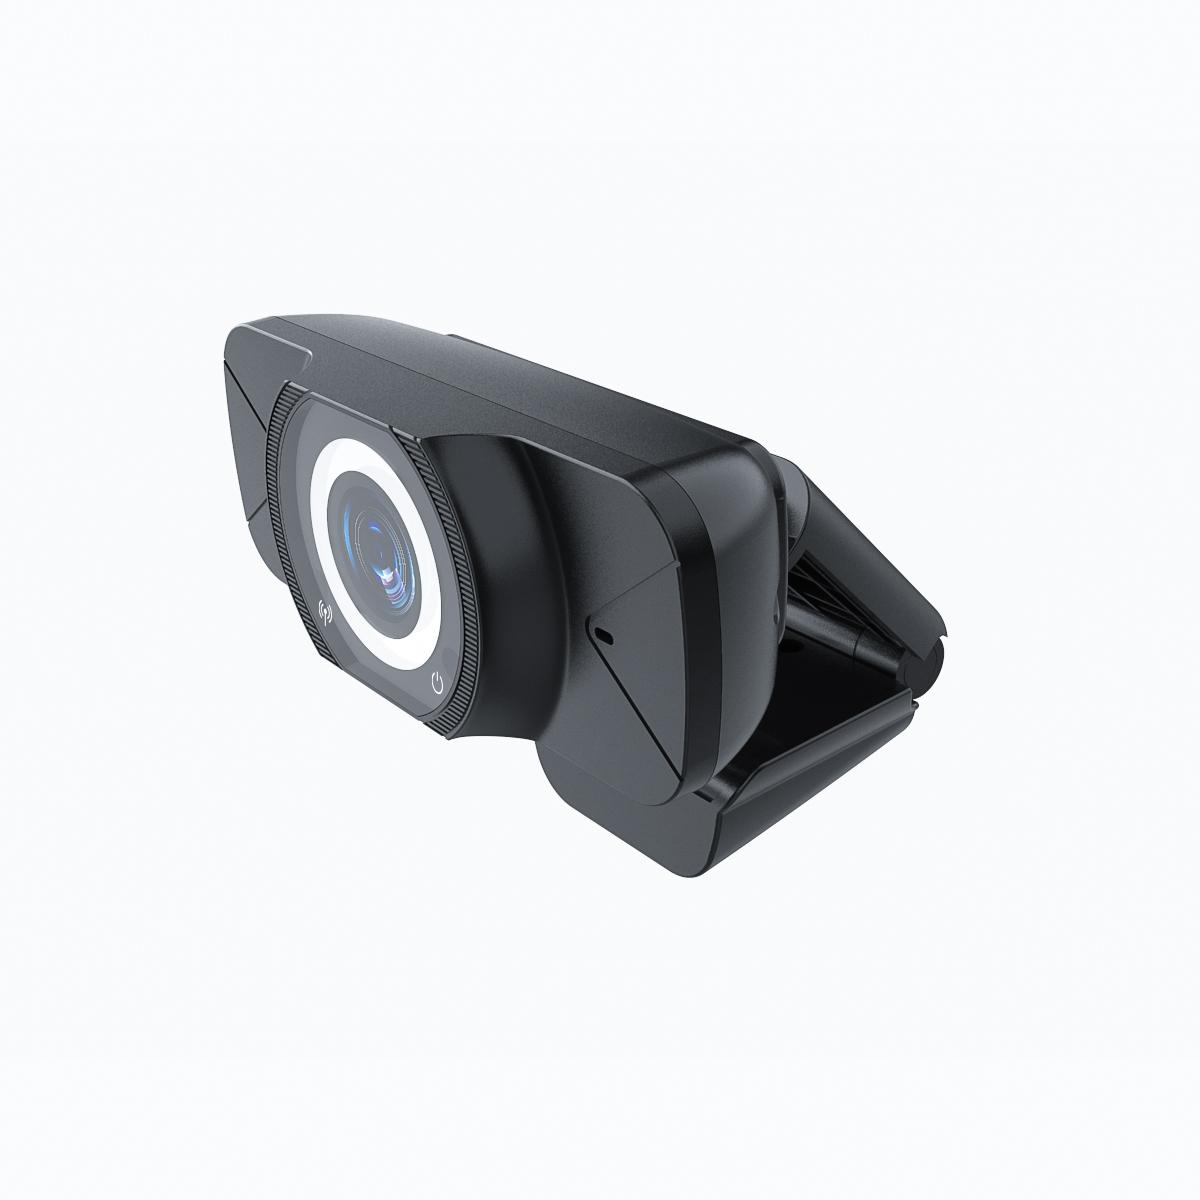 1080P 30 FPS 90 Grad Weitwinkel Gebaut-Mircophone USB HD Stick Freies Mit Abdeckung Webcam